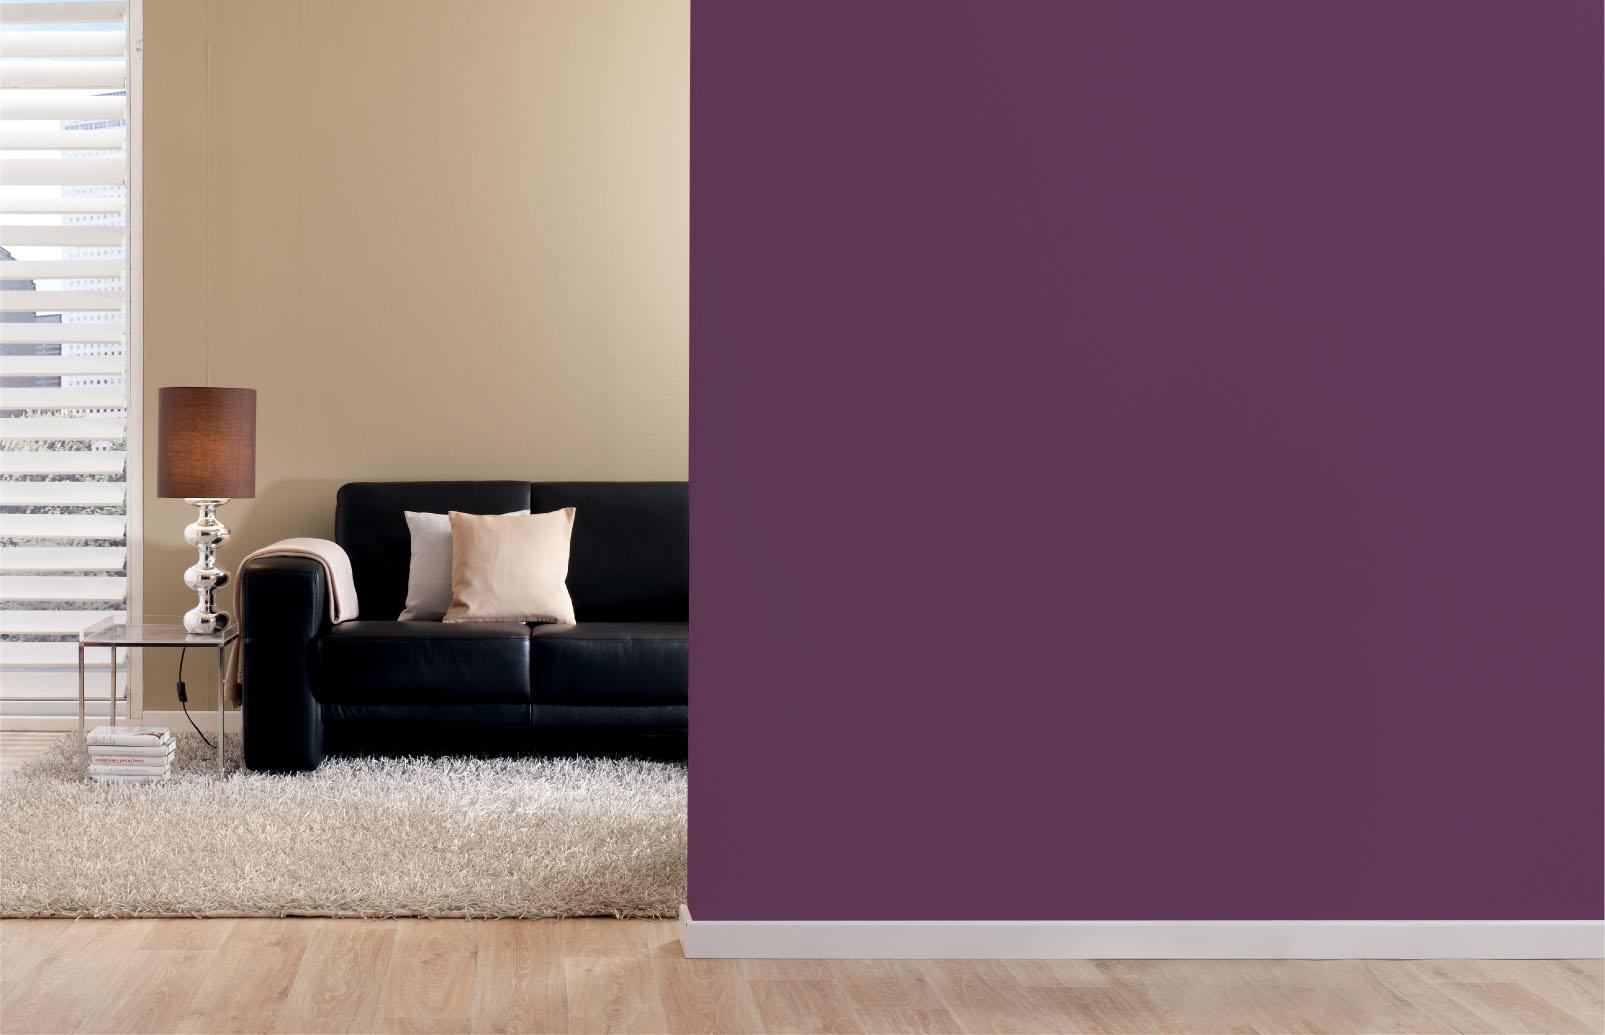 wandgestaltung mit herbstfarben alpina farbe inspiration. Black Bedroom Furniture Sets. Home Design Ideas